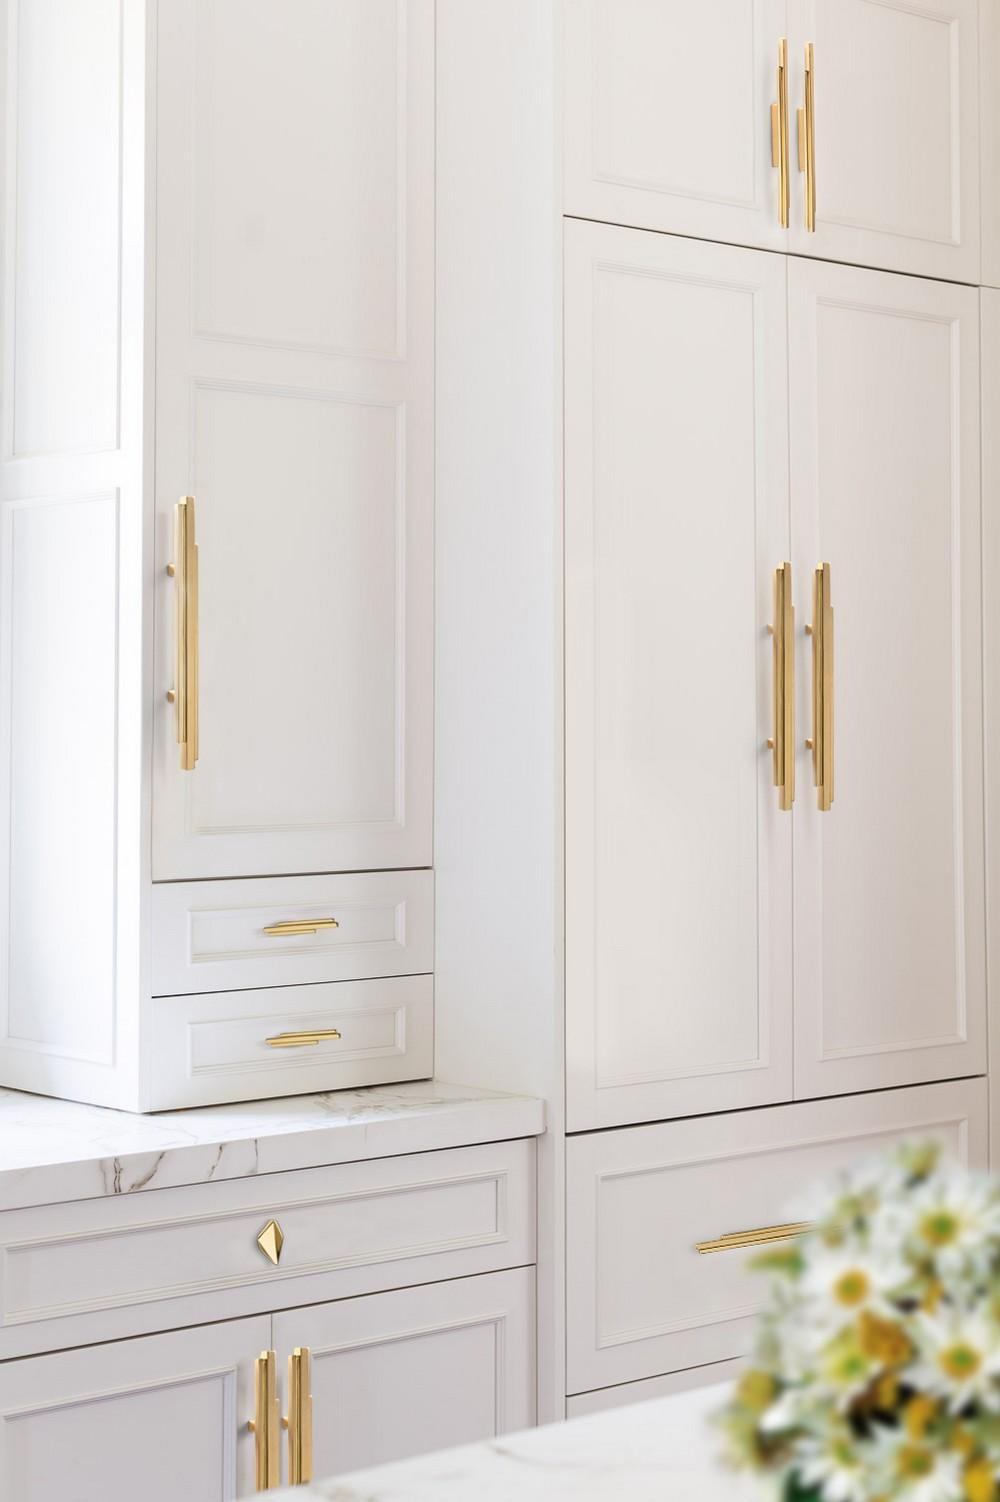 Kitchen Ideas 12 Exceptional Interiors Featuring Cabinet Hardware_3 kitchen ideas Kitchen Ideas: 12 Exceptional Interiors Featuring Cabinet Hardware Kitchen Ideas 12 Exceptional Interiors Featuring Cabinet Hardware 3